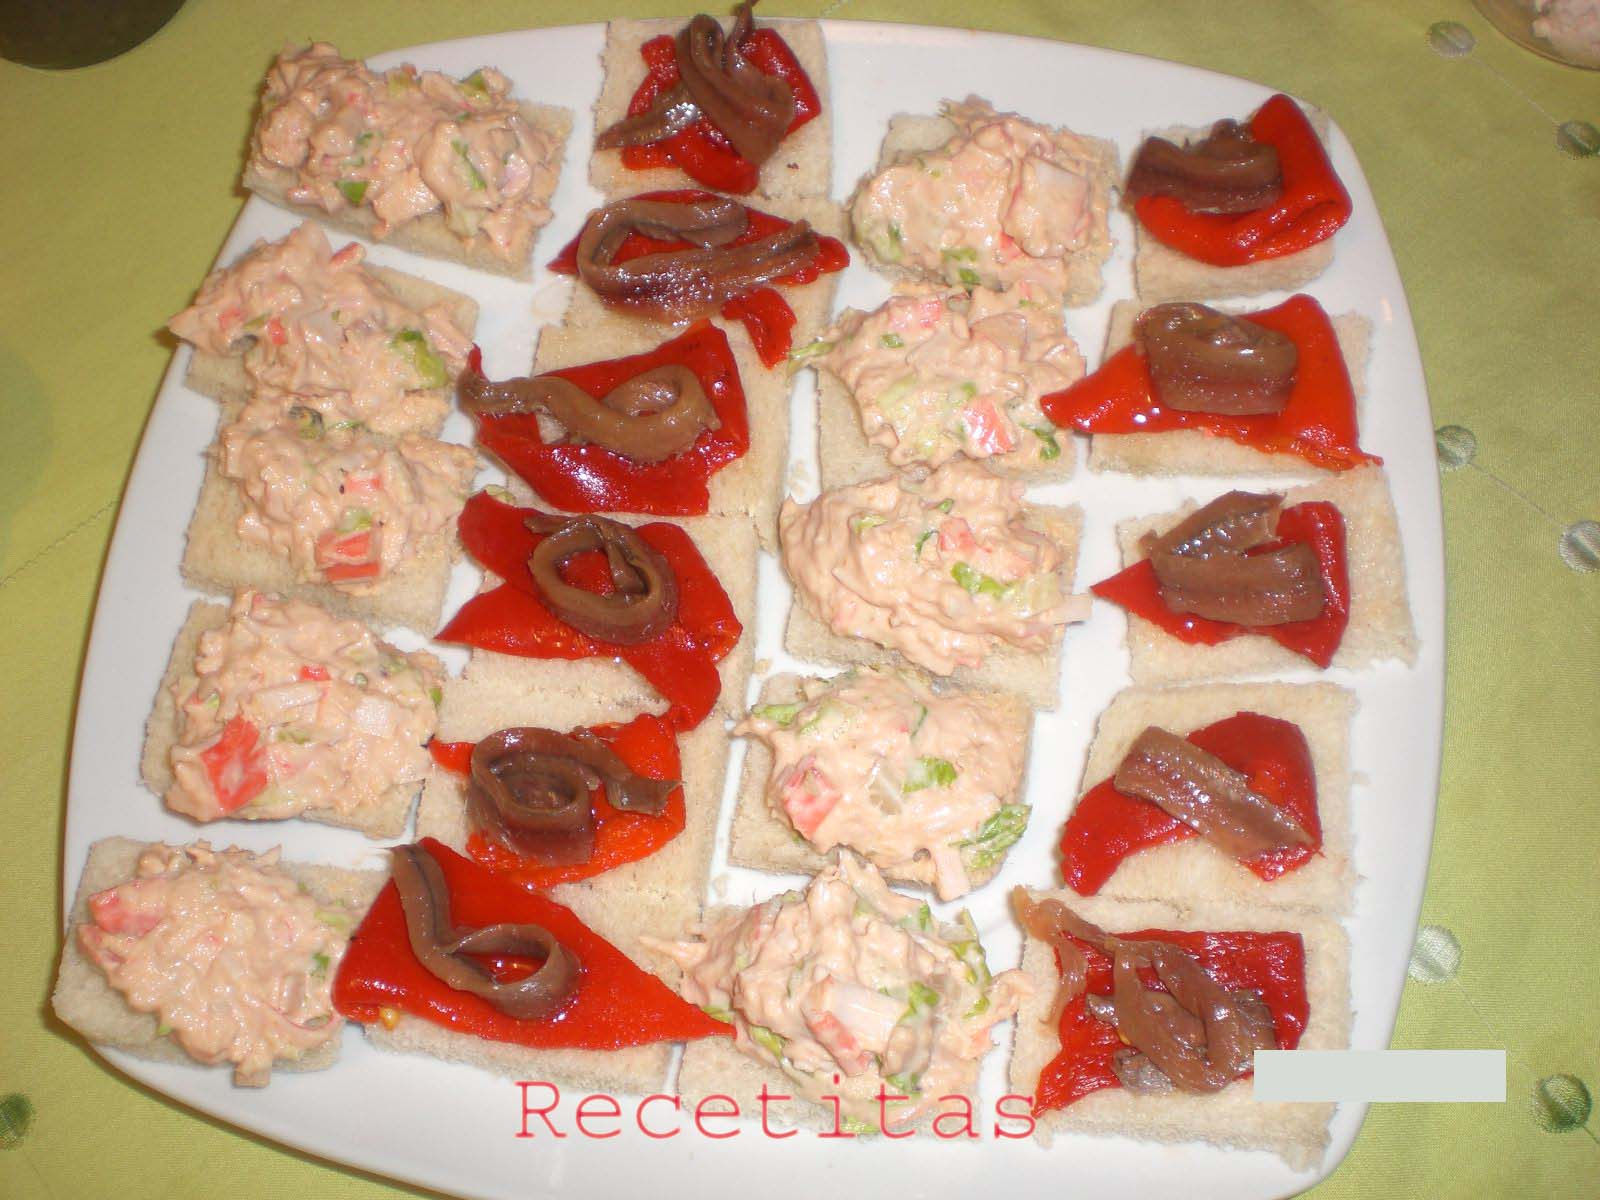 Canapes 2 mis humildes recetitas for Canape de cangrejo